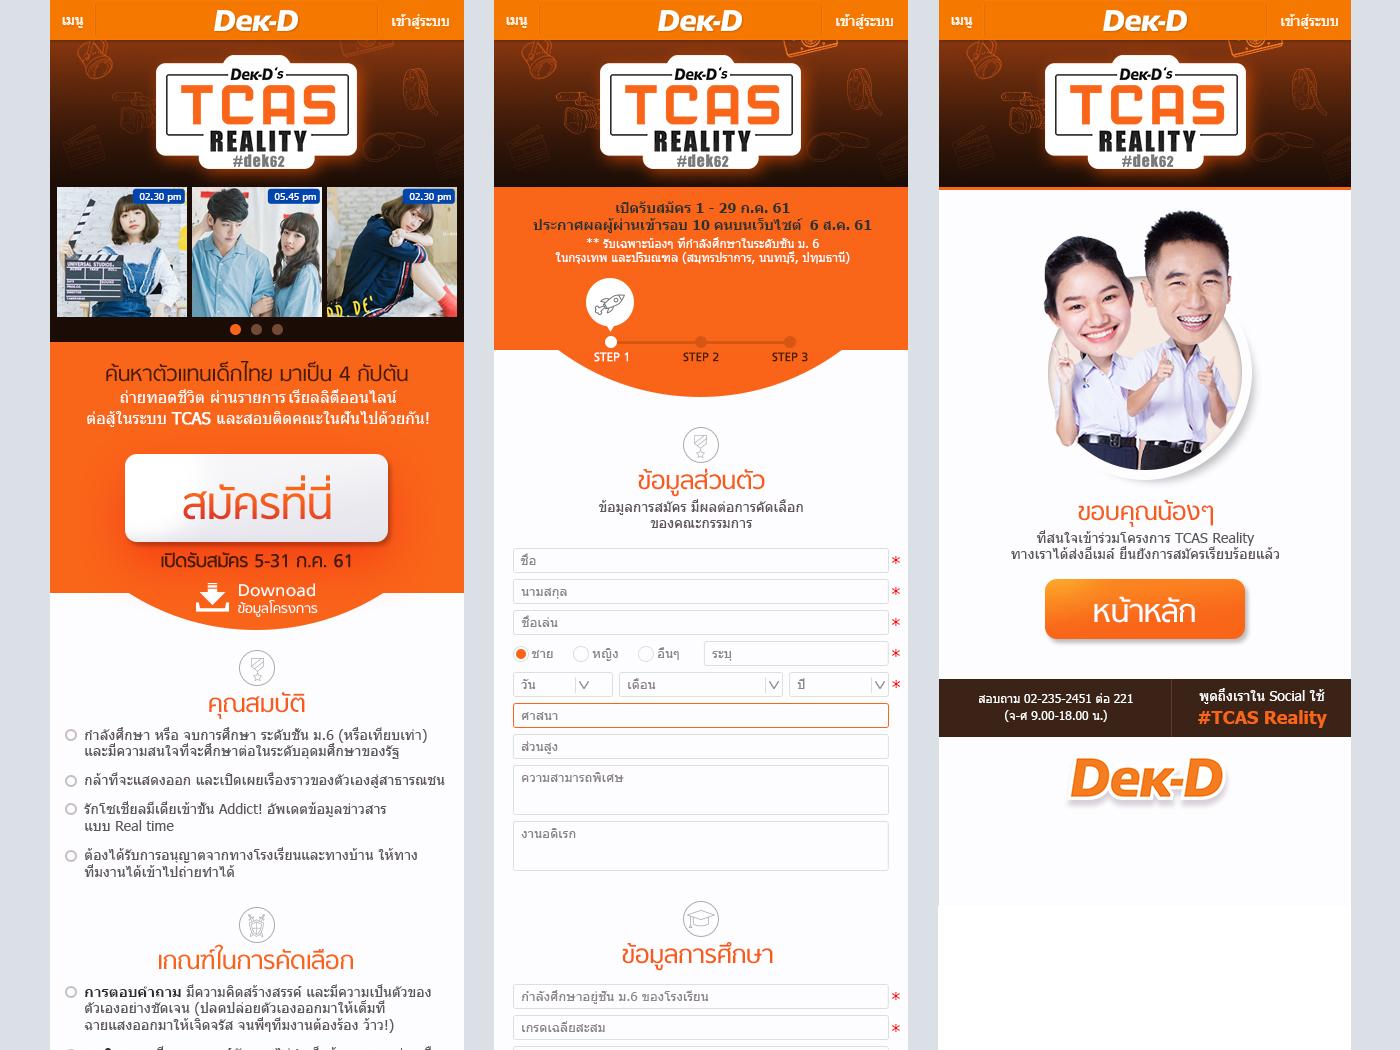 Reality 1 art direction creative direction graphic designer retouching ui ux web design mobile